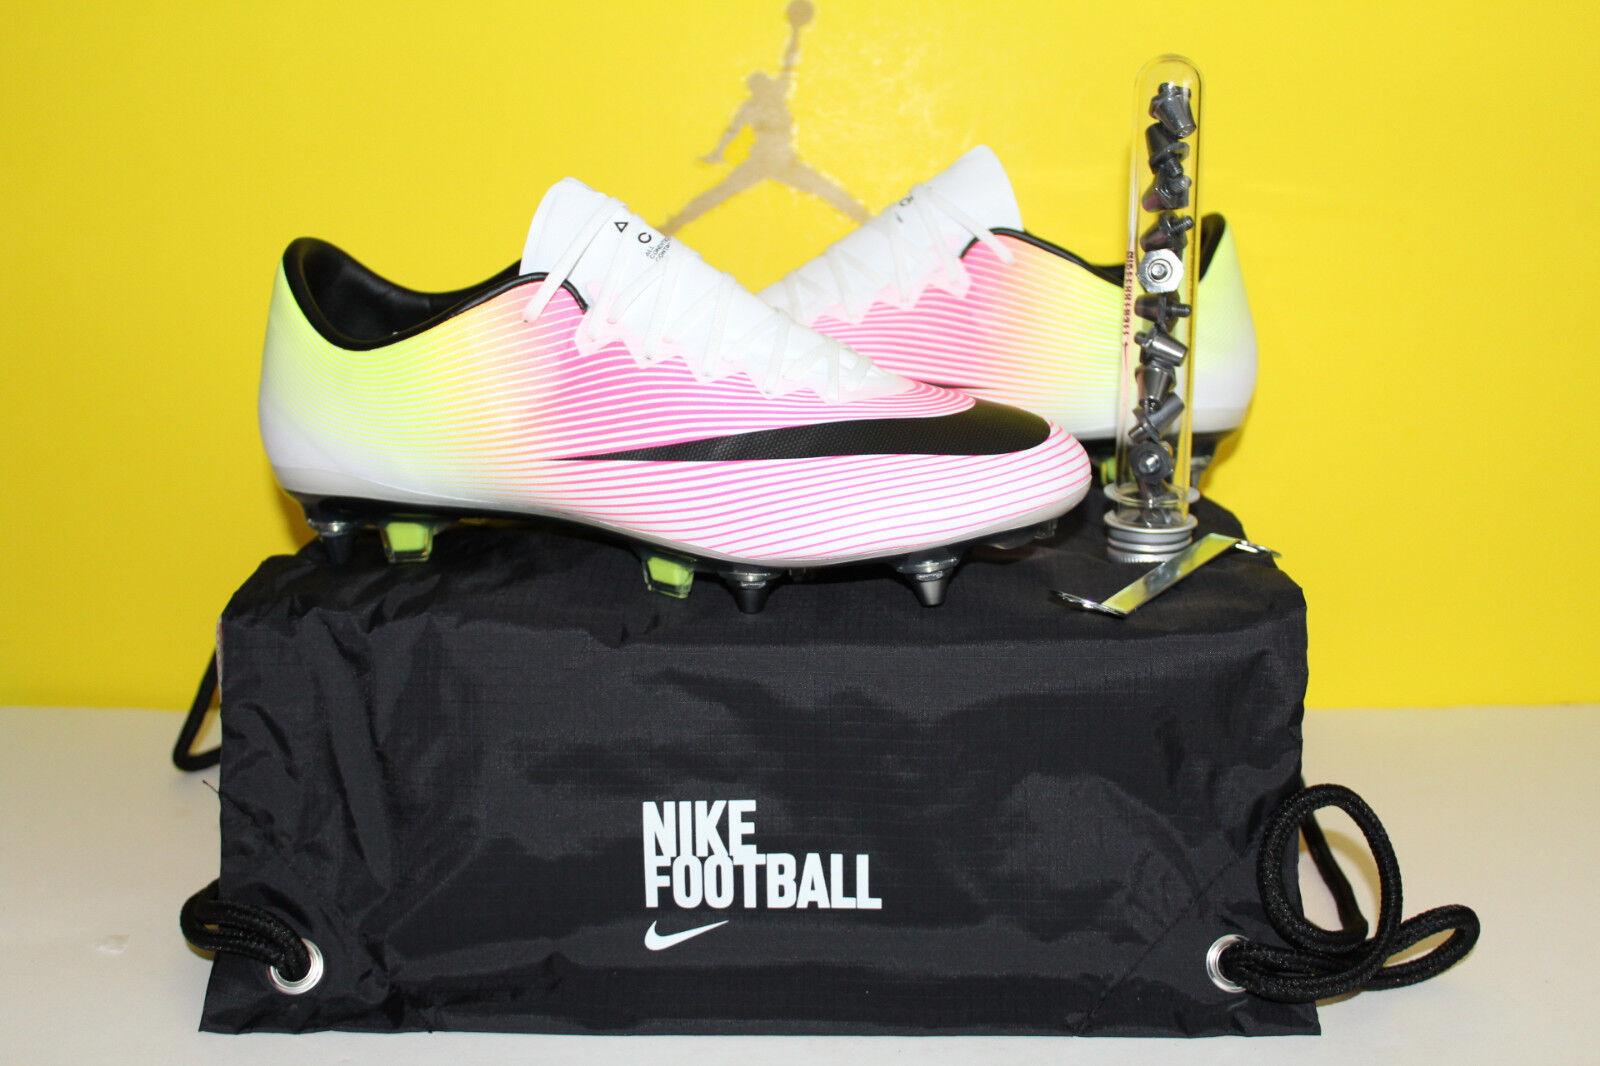 Nike Mercurial Vapor X SG-Pro Soccer Cleats 648555 108 Size 12 US